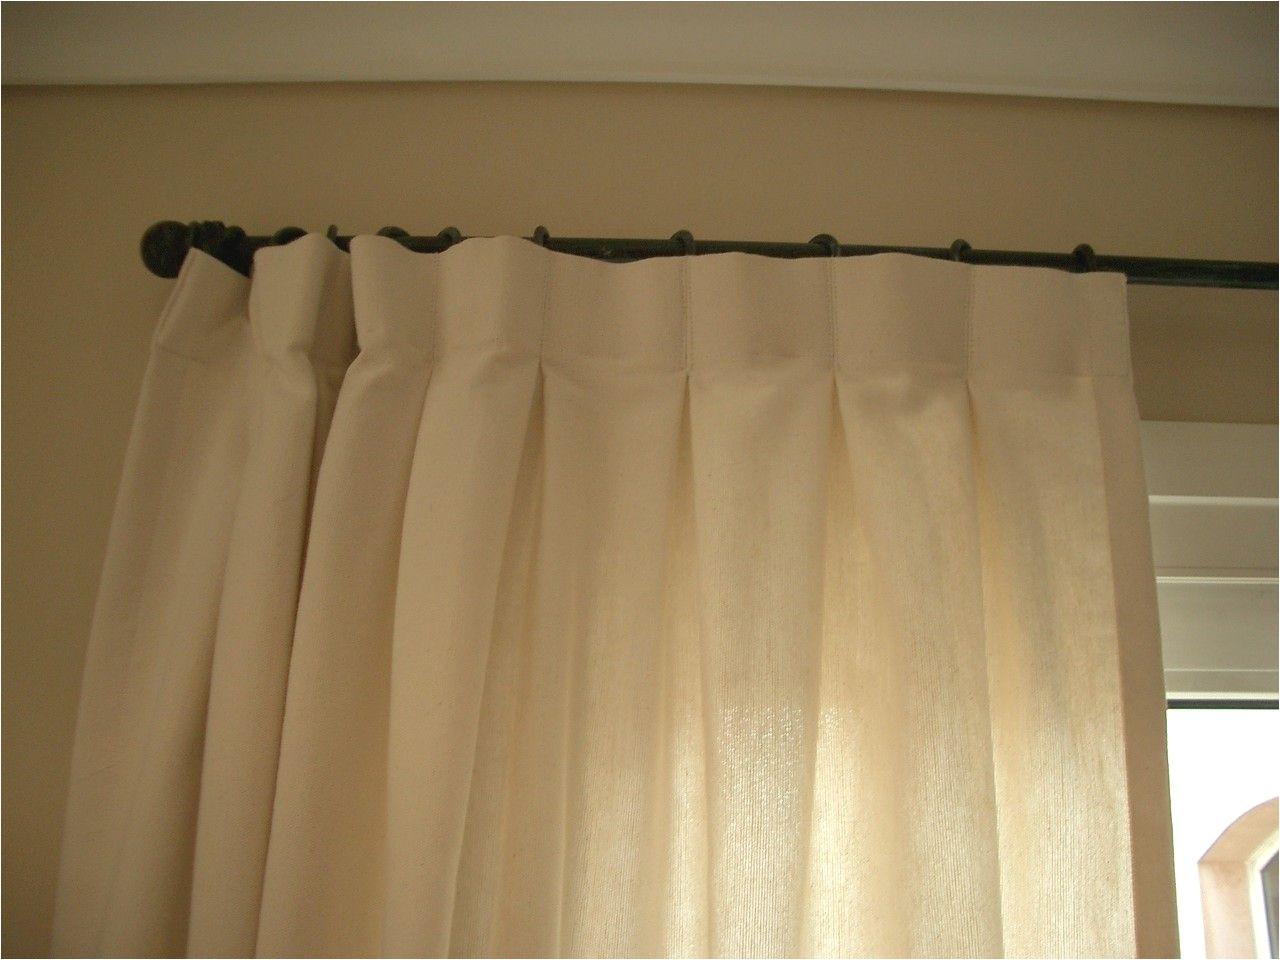 cortina pesada con cabezal de tabla encontrada romina guerrero